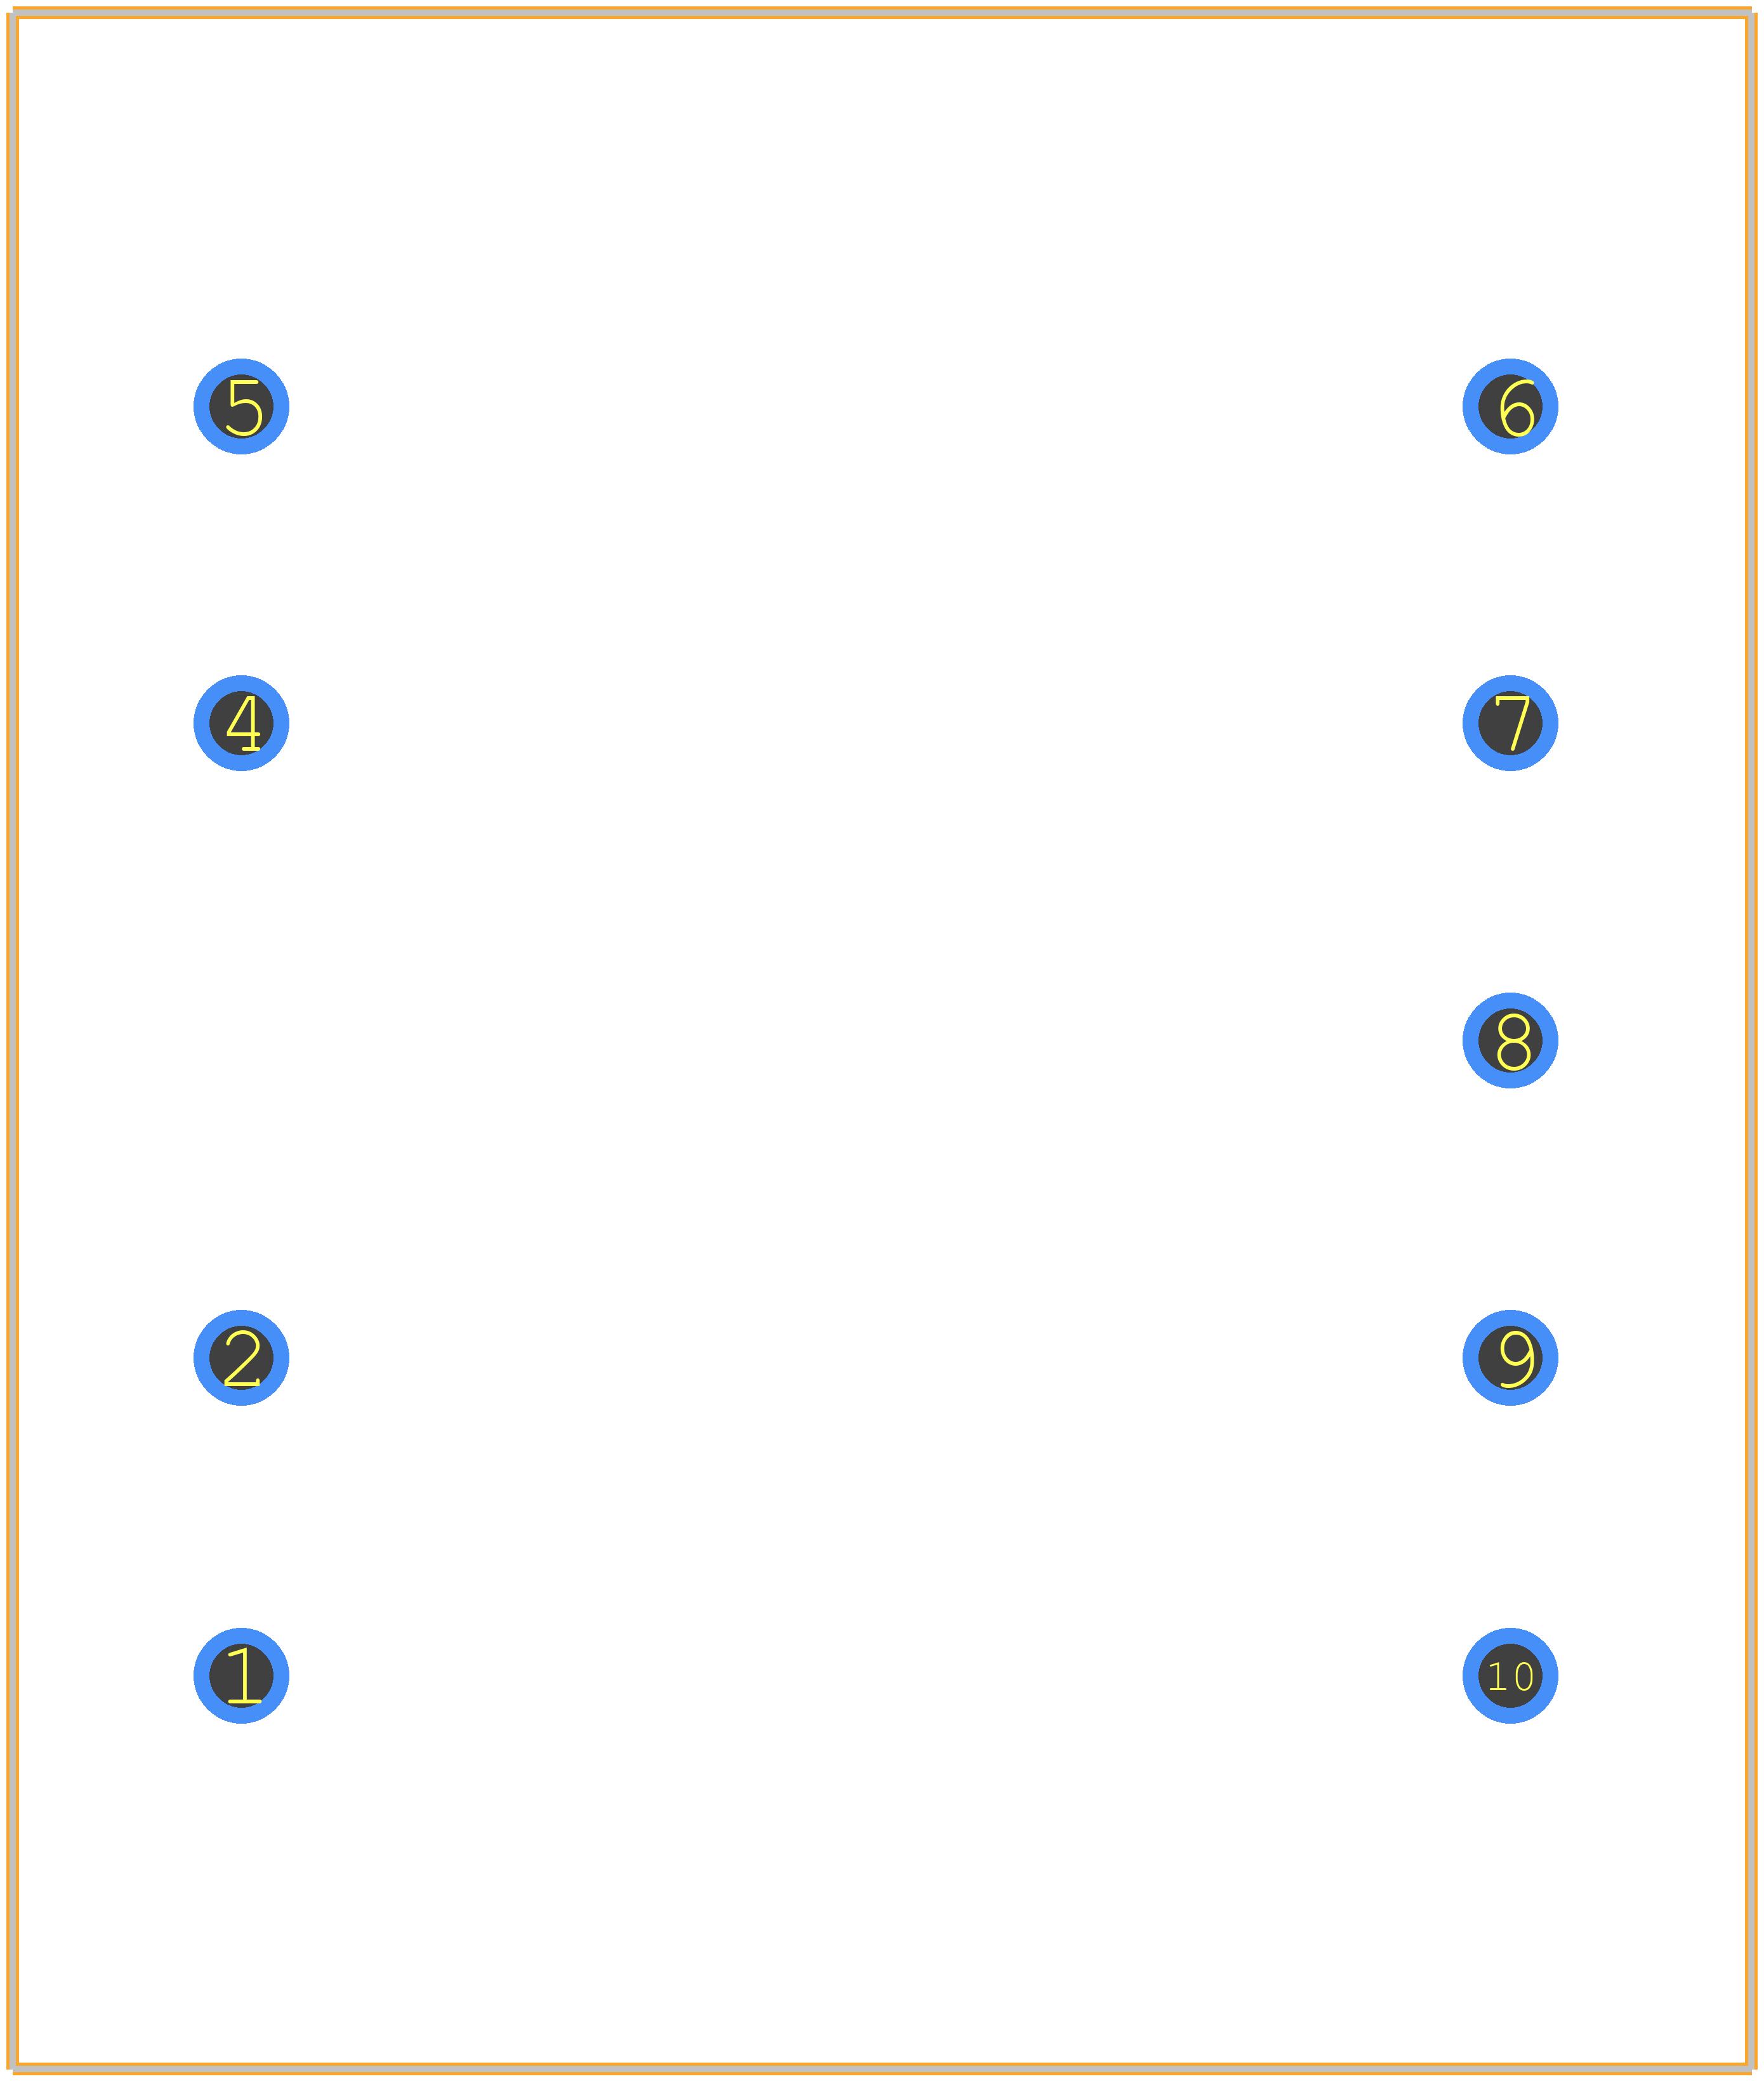 AVB2.3/2/9 - BLOCK PCB footprint - Other - AVB2.3/2